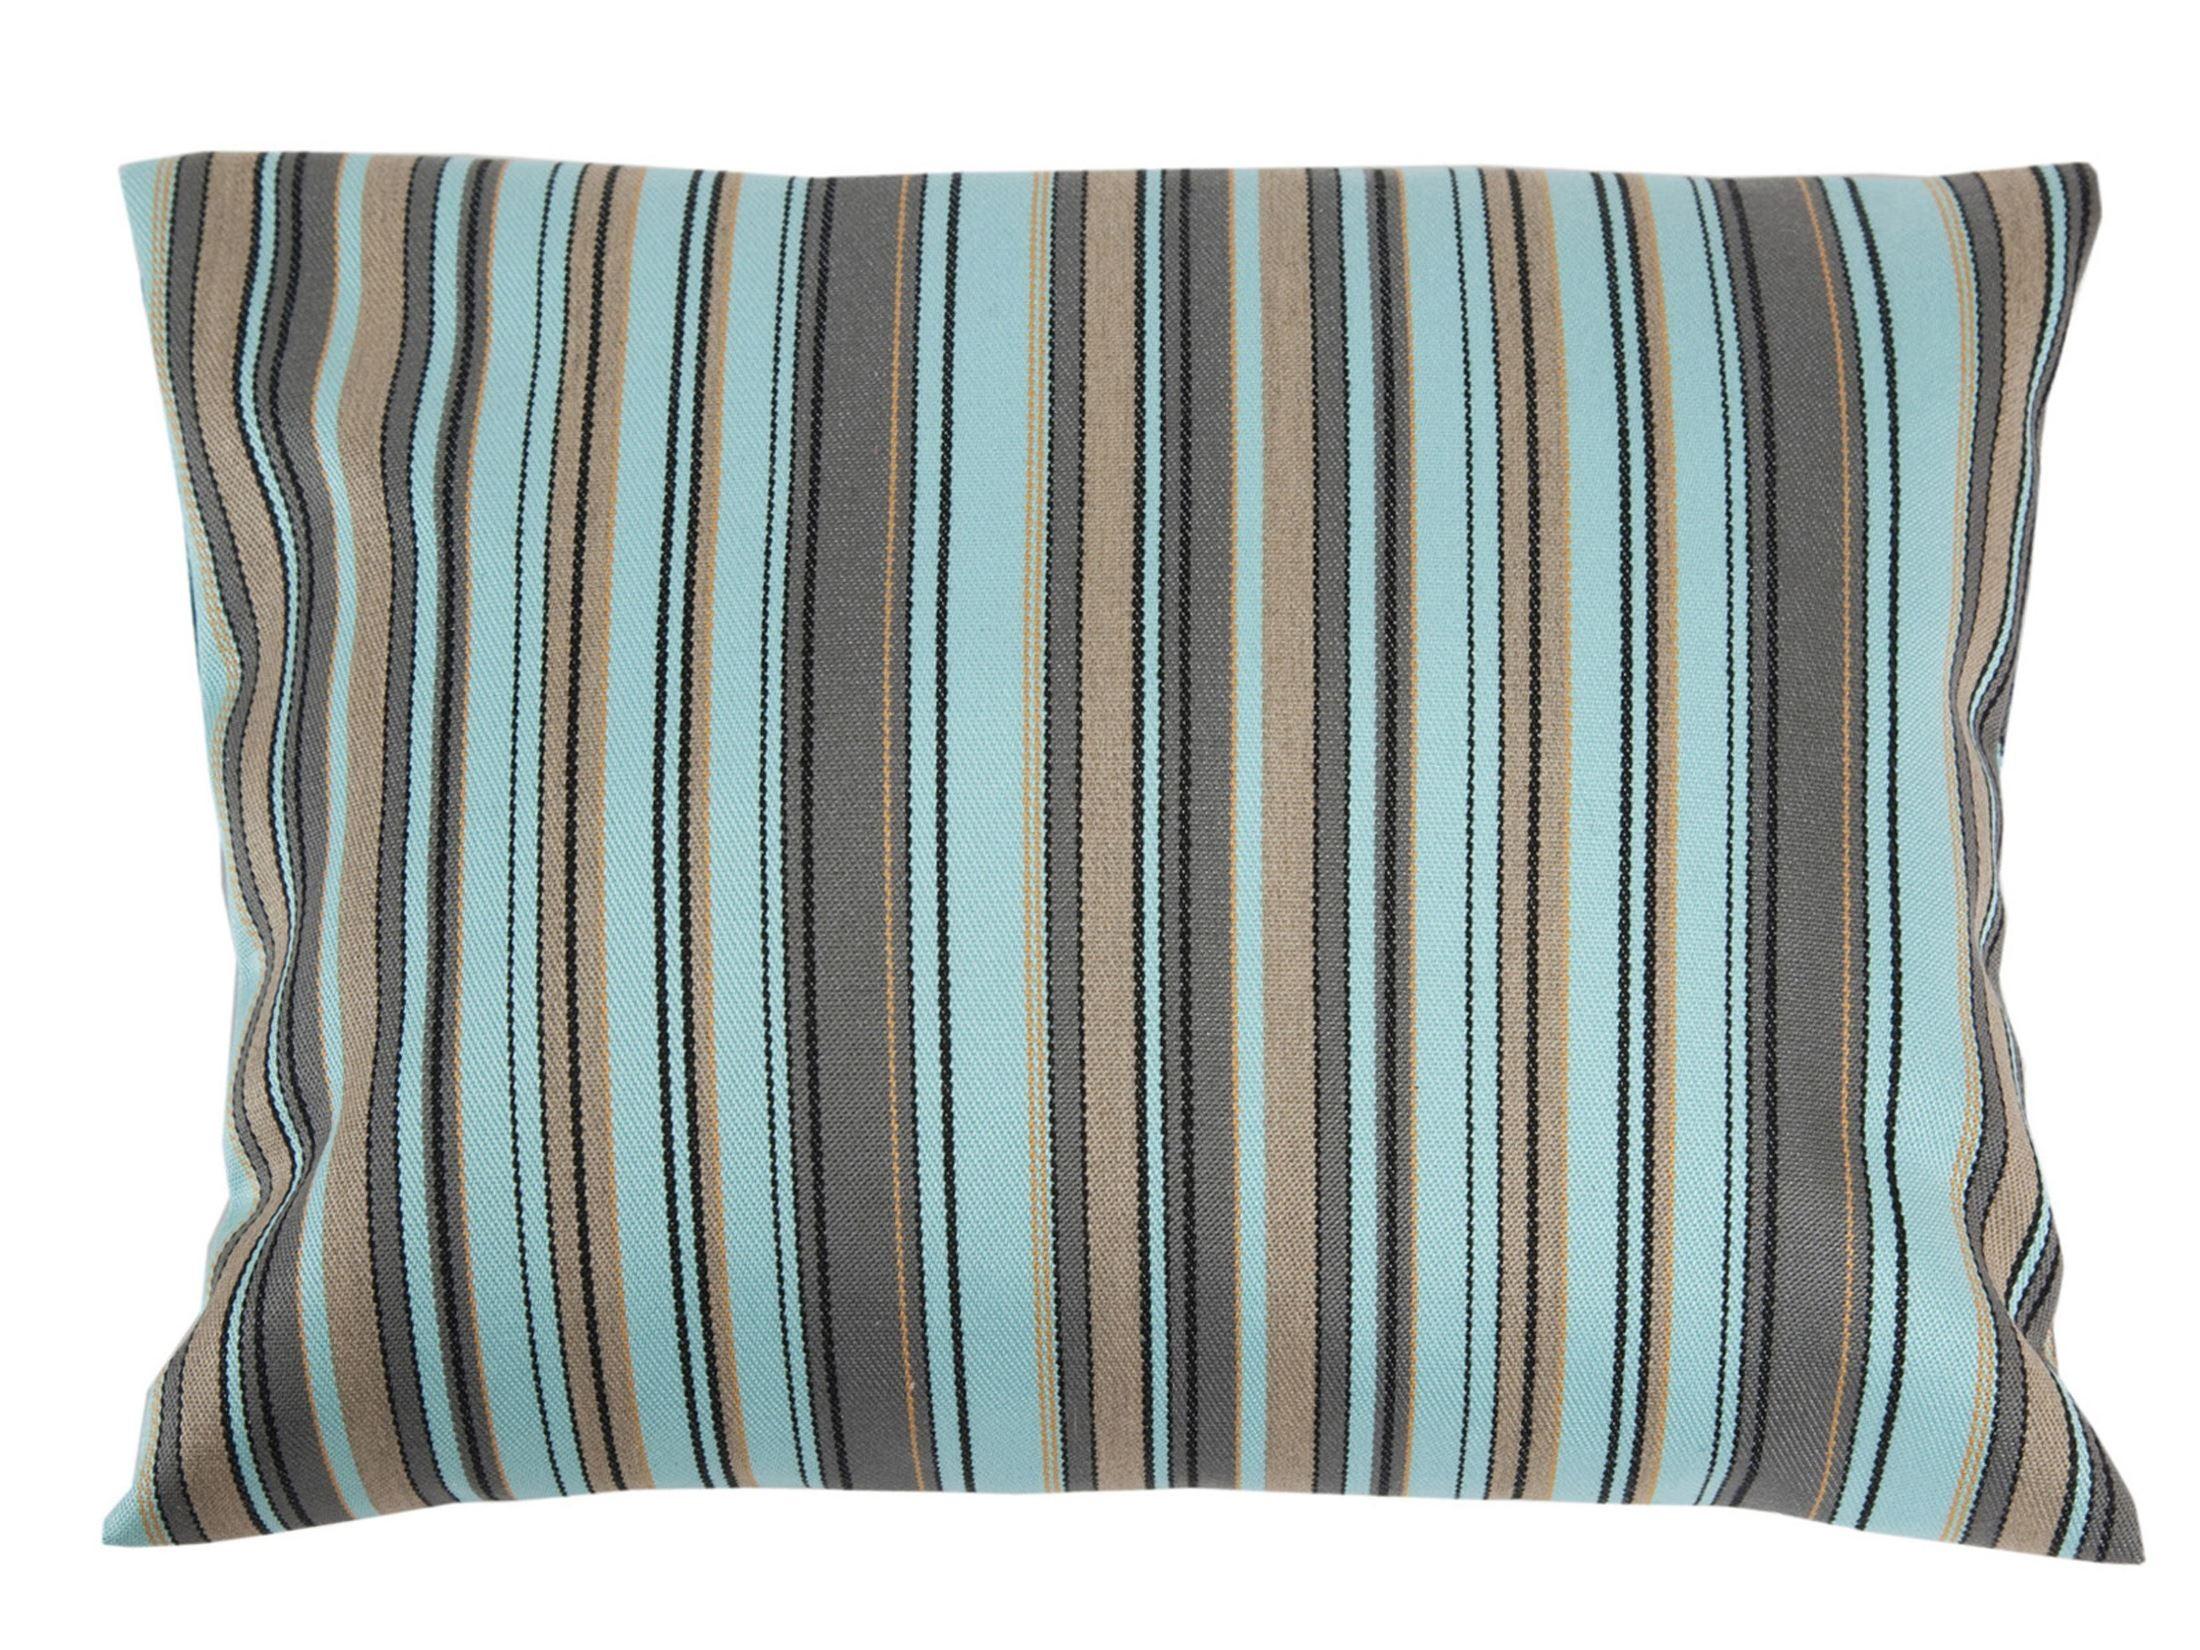 chair headrest pillow antique barber parts generations aqua cushion from cr plastic